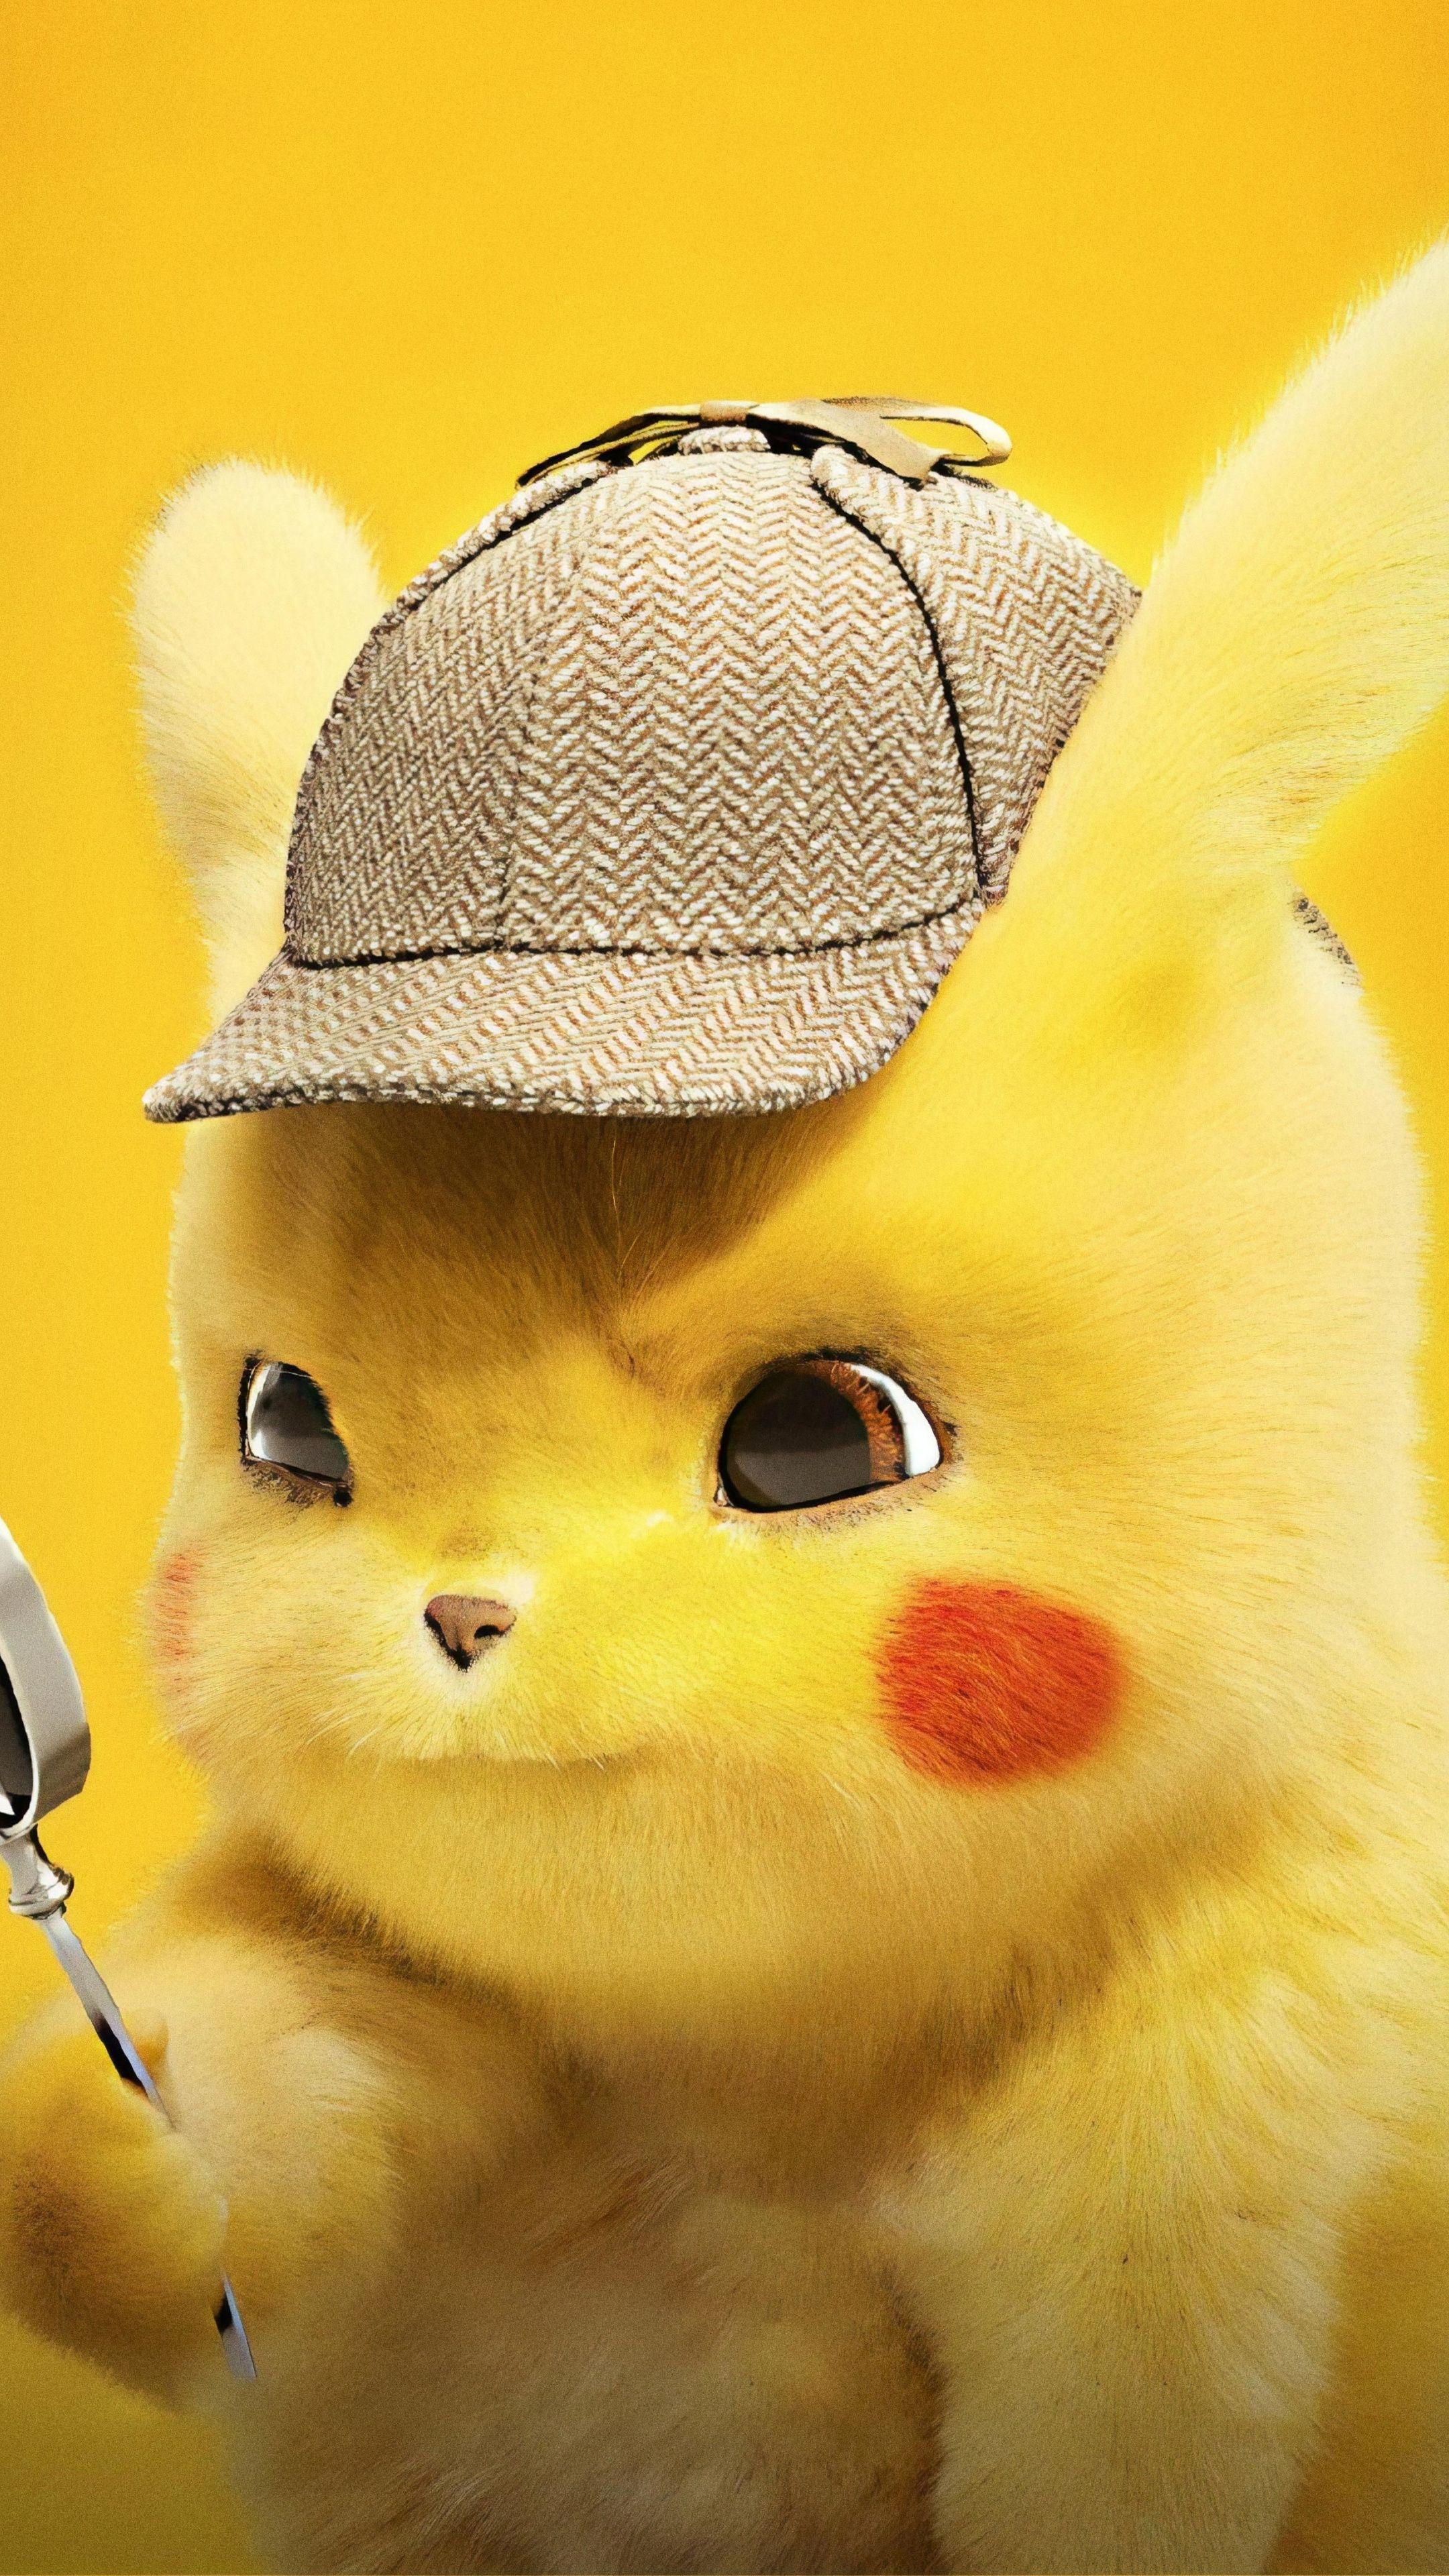 2160x3840 Pikachu Cute Pokemon Detective Pikachu 2019 Wallpaper Cute Pikachu Pikachu Art Pikachu Wallpaper Iphone